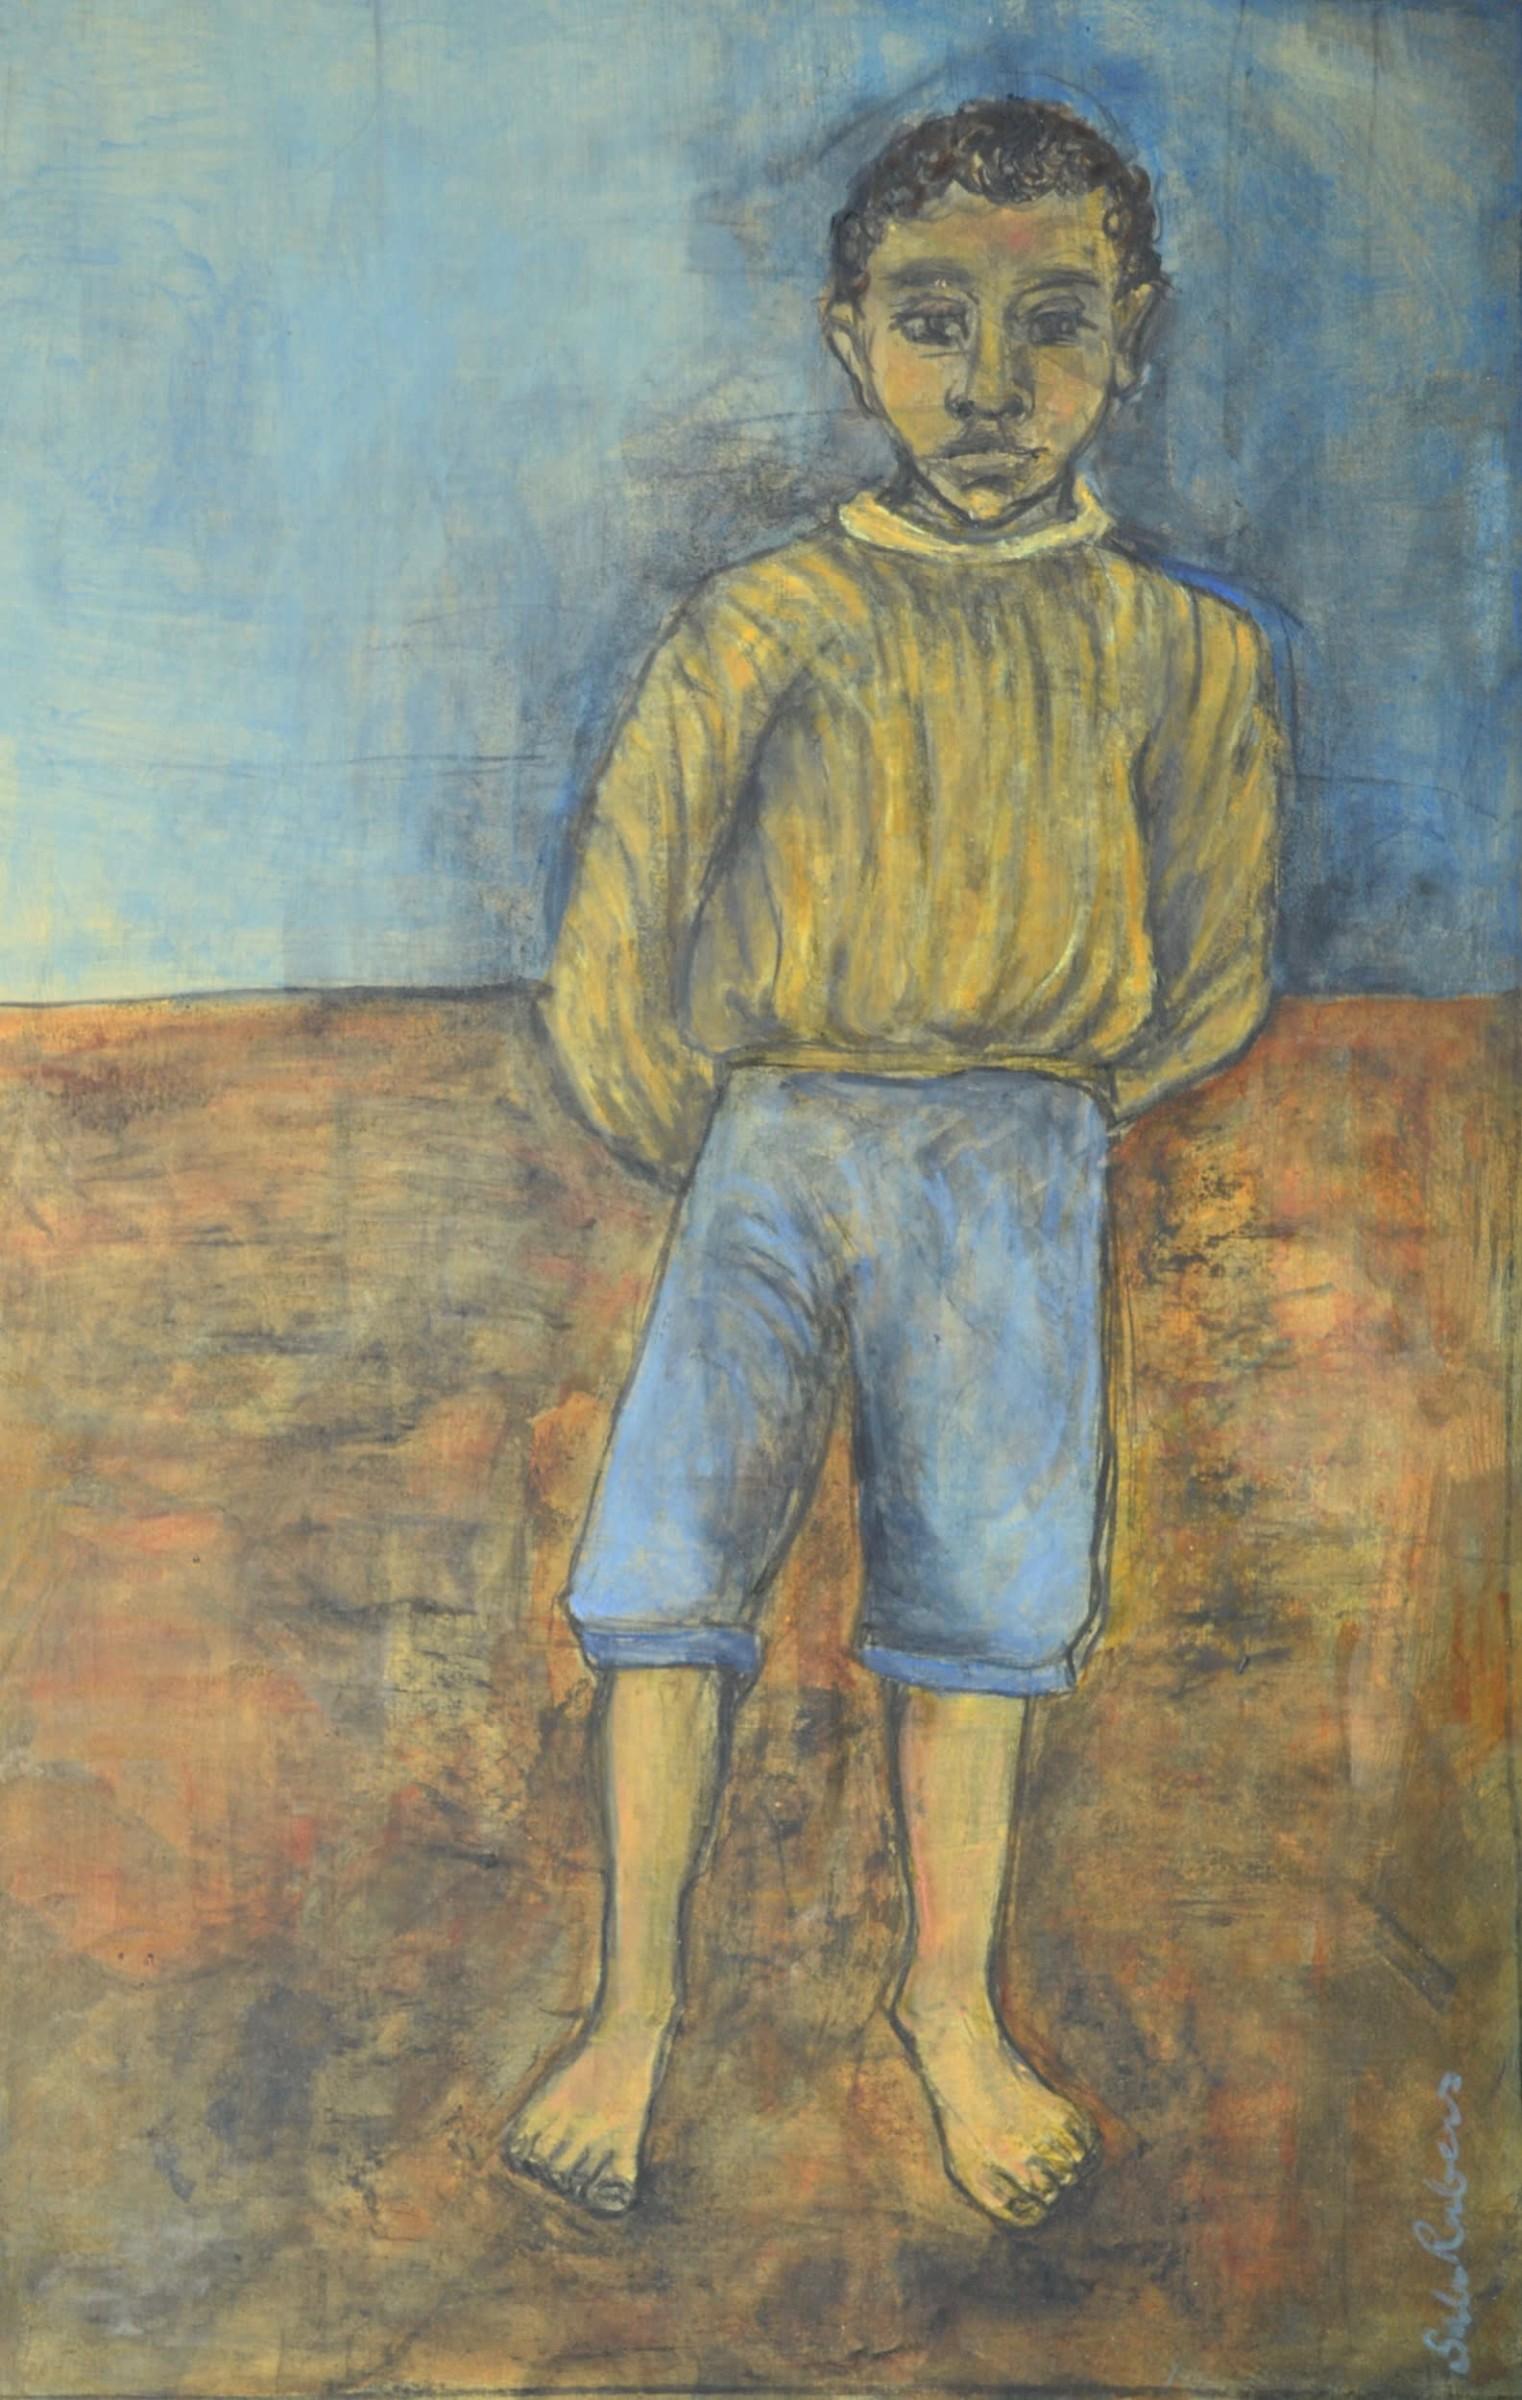 "<span class=""link fancybox-details-link""><a href=""/exhibitions/39/works/artworks_standalone12481/"">View Detail Page</a></span><div class=""medium"">ink, charcoal, watercolour & pastel on paper</div><div class=""dimensions"">Frame: 80 x 61.4 cm<br /> Artwork: 54 x 37 cm</div>"